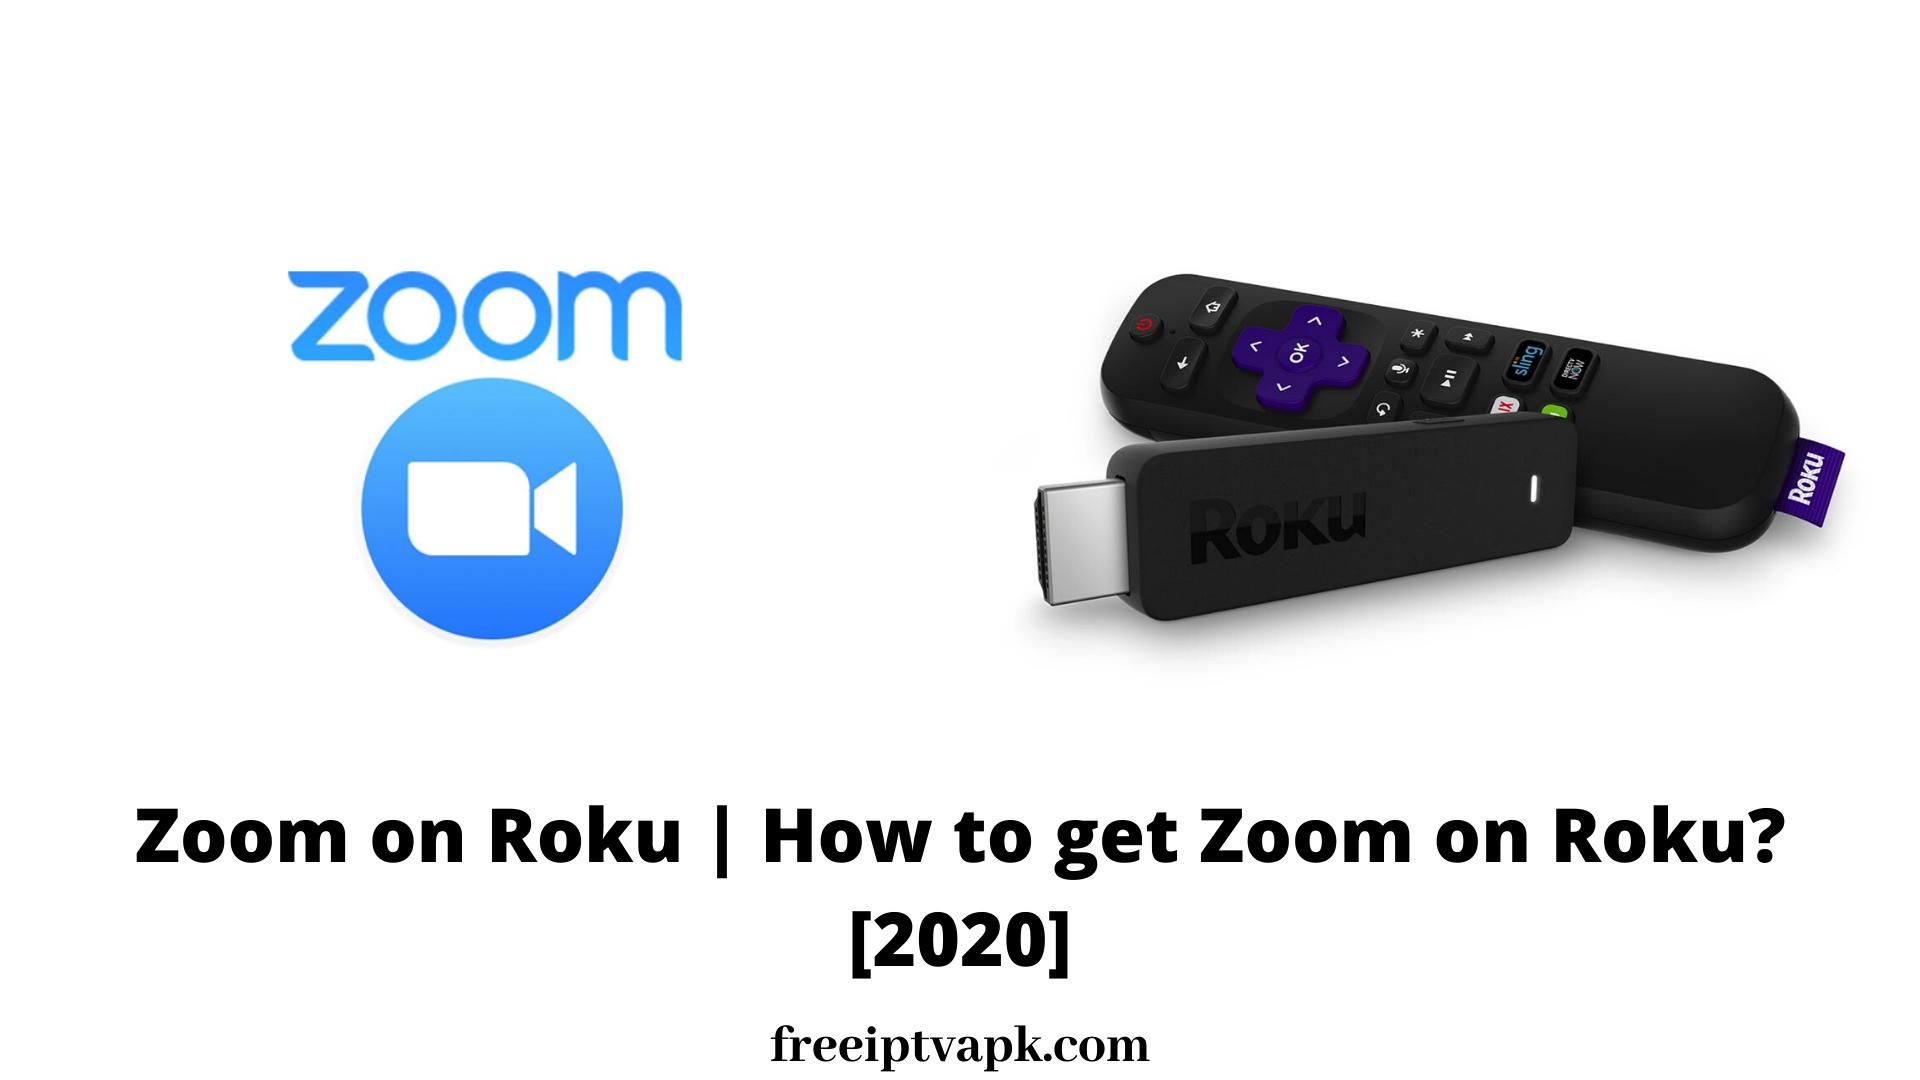 Zoom on Roku | How to get Zoom on Roku? [2020]